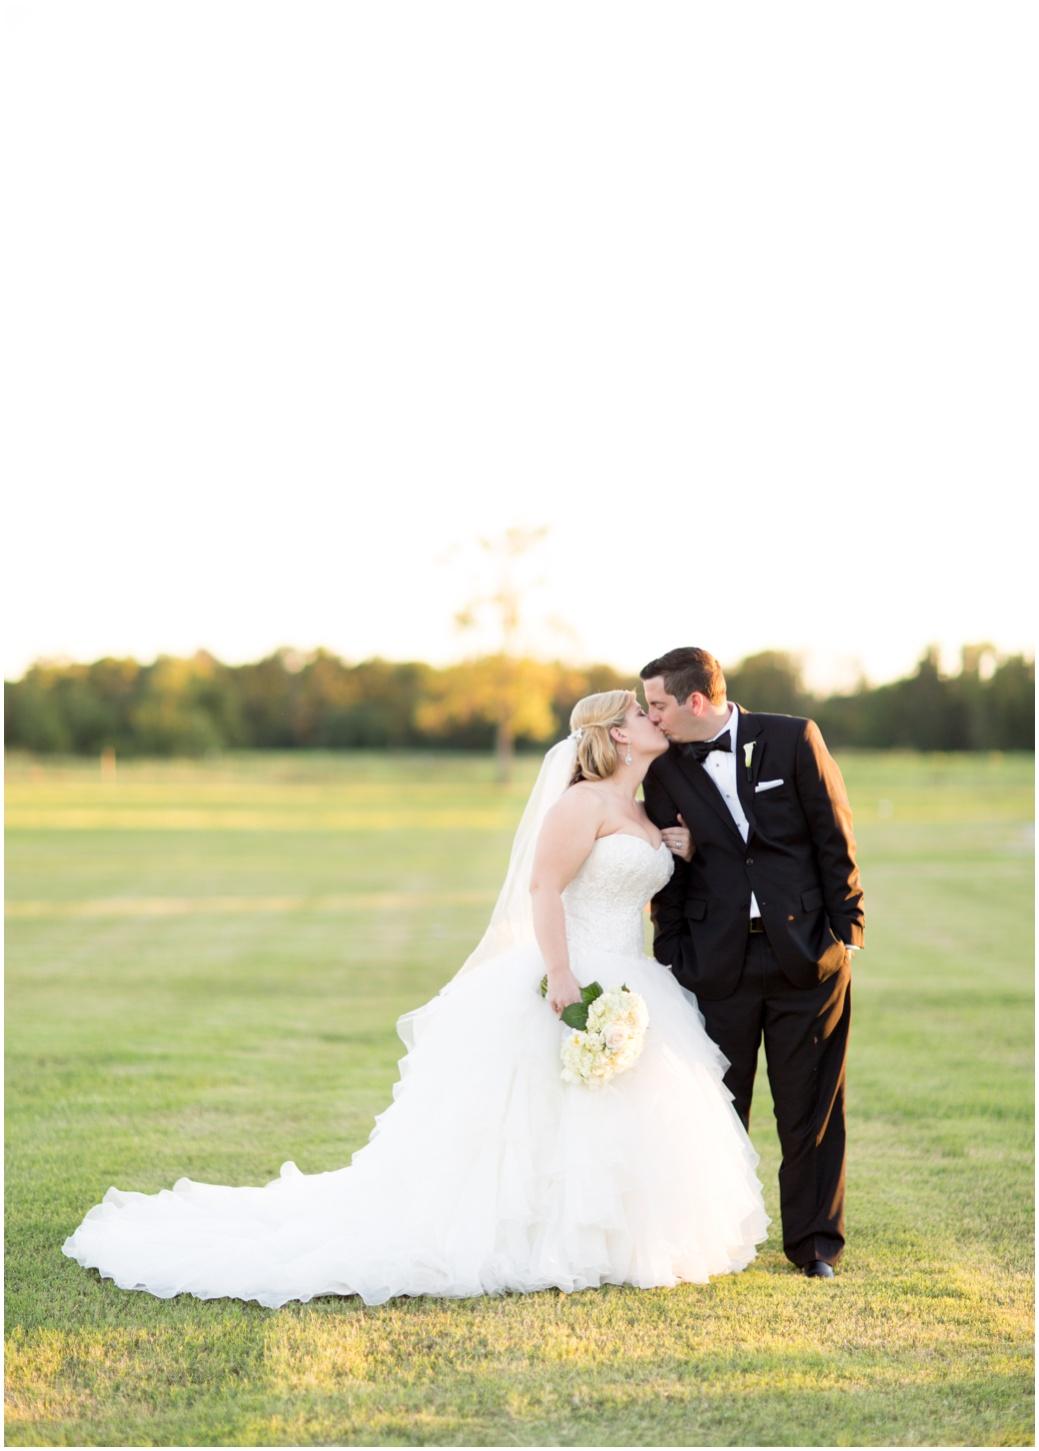 Sarah Best Photography - Jolly Wedding Olde Dobbin Station-344_STP.jpg